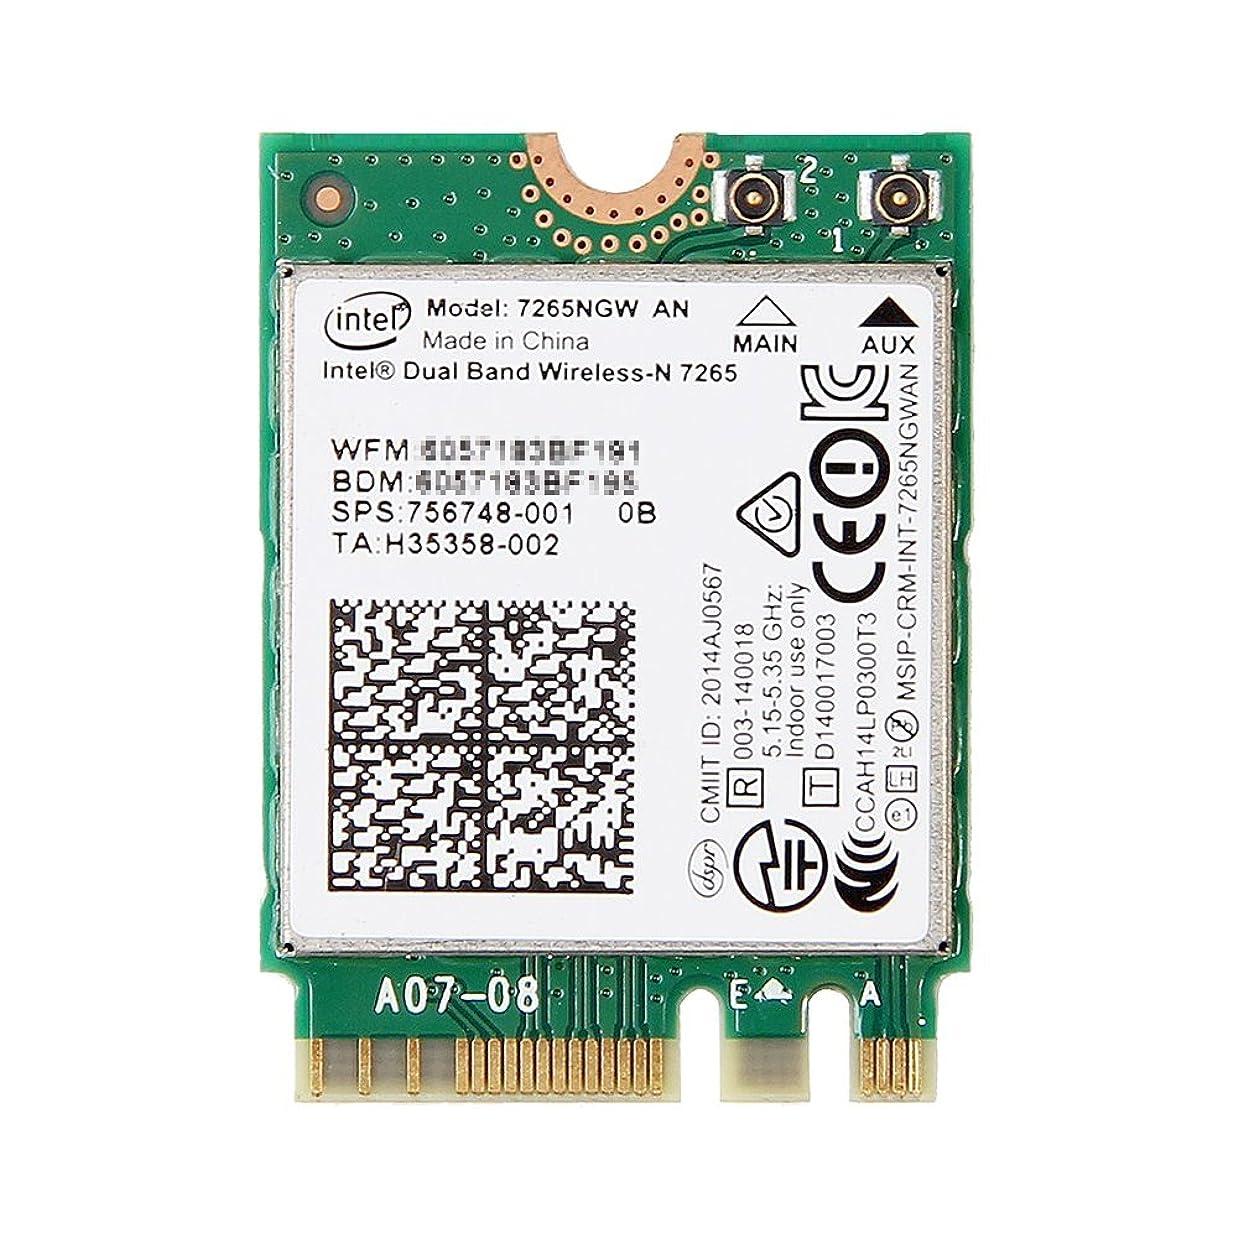 HP純正 756748-001 Intel Dual Band Wireless-N 7265 Dual Band 2x2 802.11a/b/g/n + Bluetooth 4.0 M.2 無線LANカード 7265NGW AN for HP